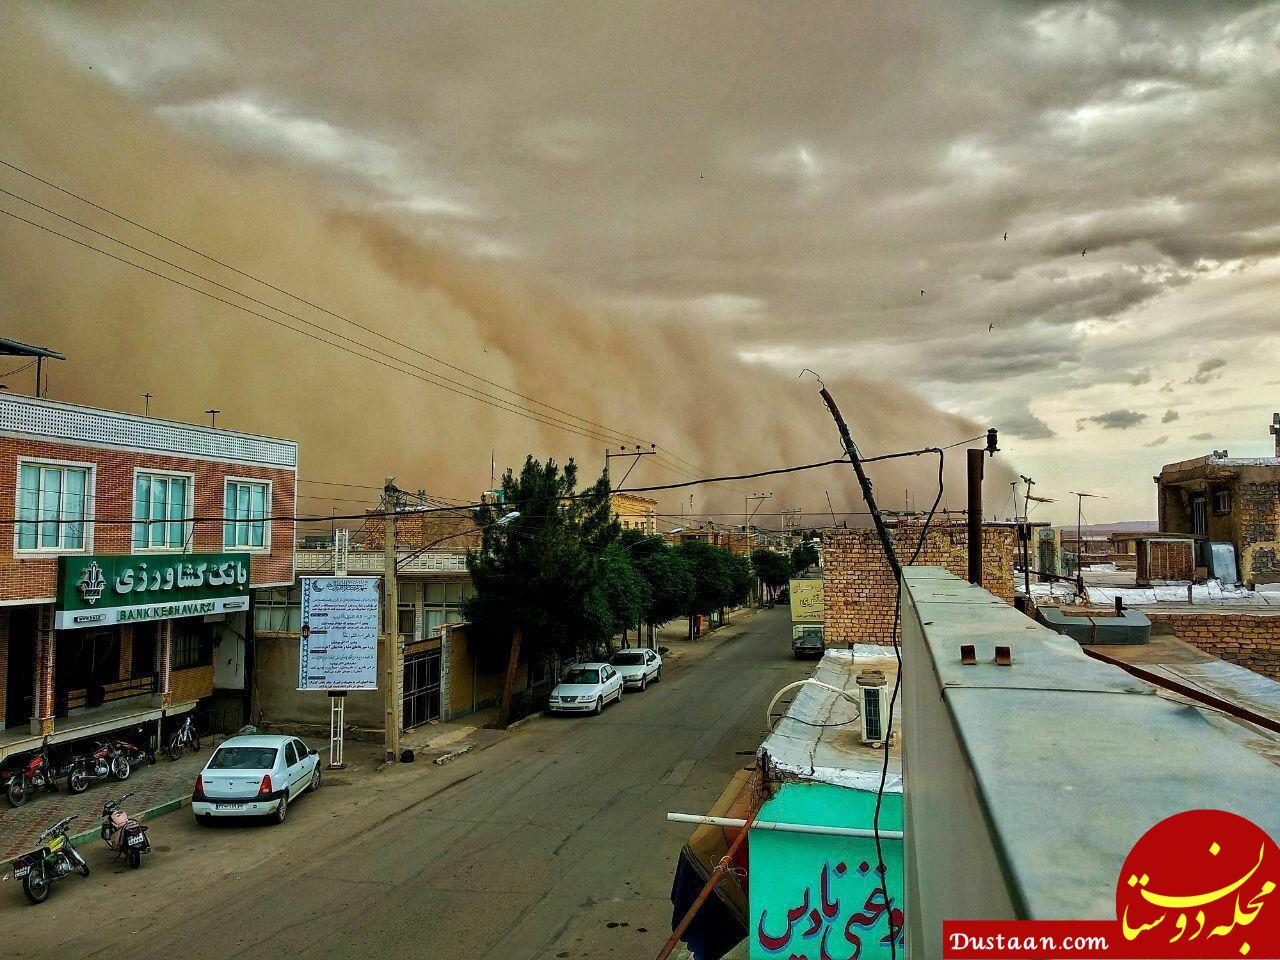 www.dustaan.com لحظه عجیب ورود طوفان به آران و بیدگل +عکس